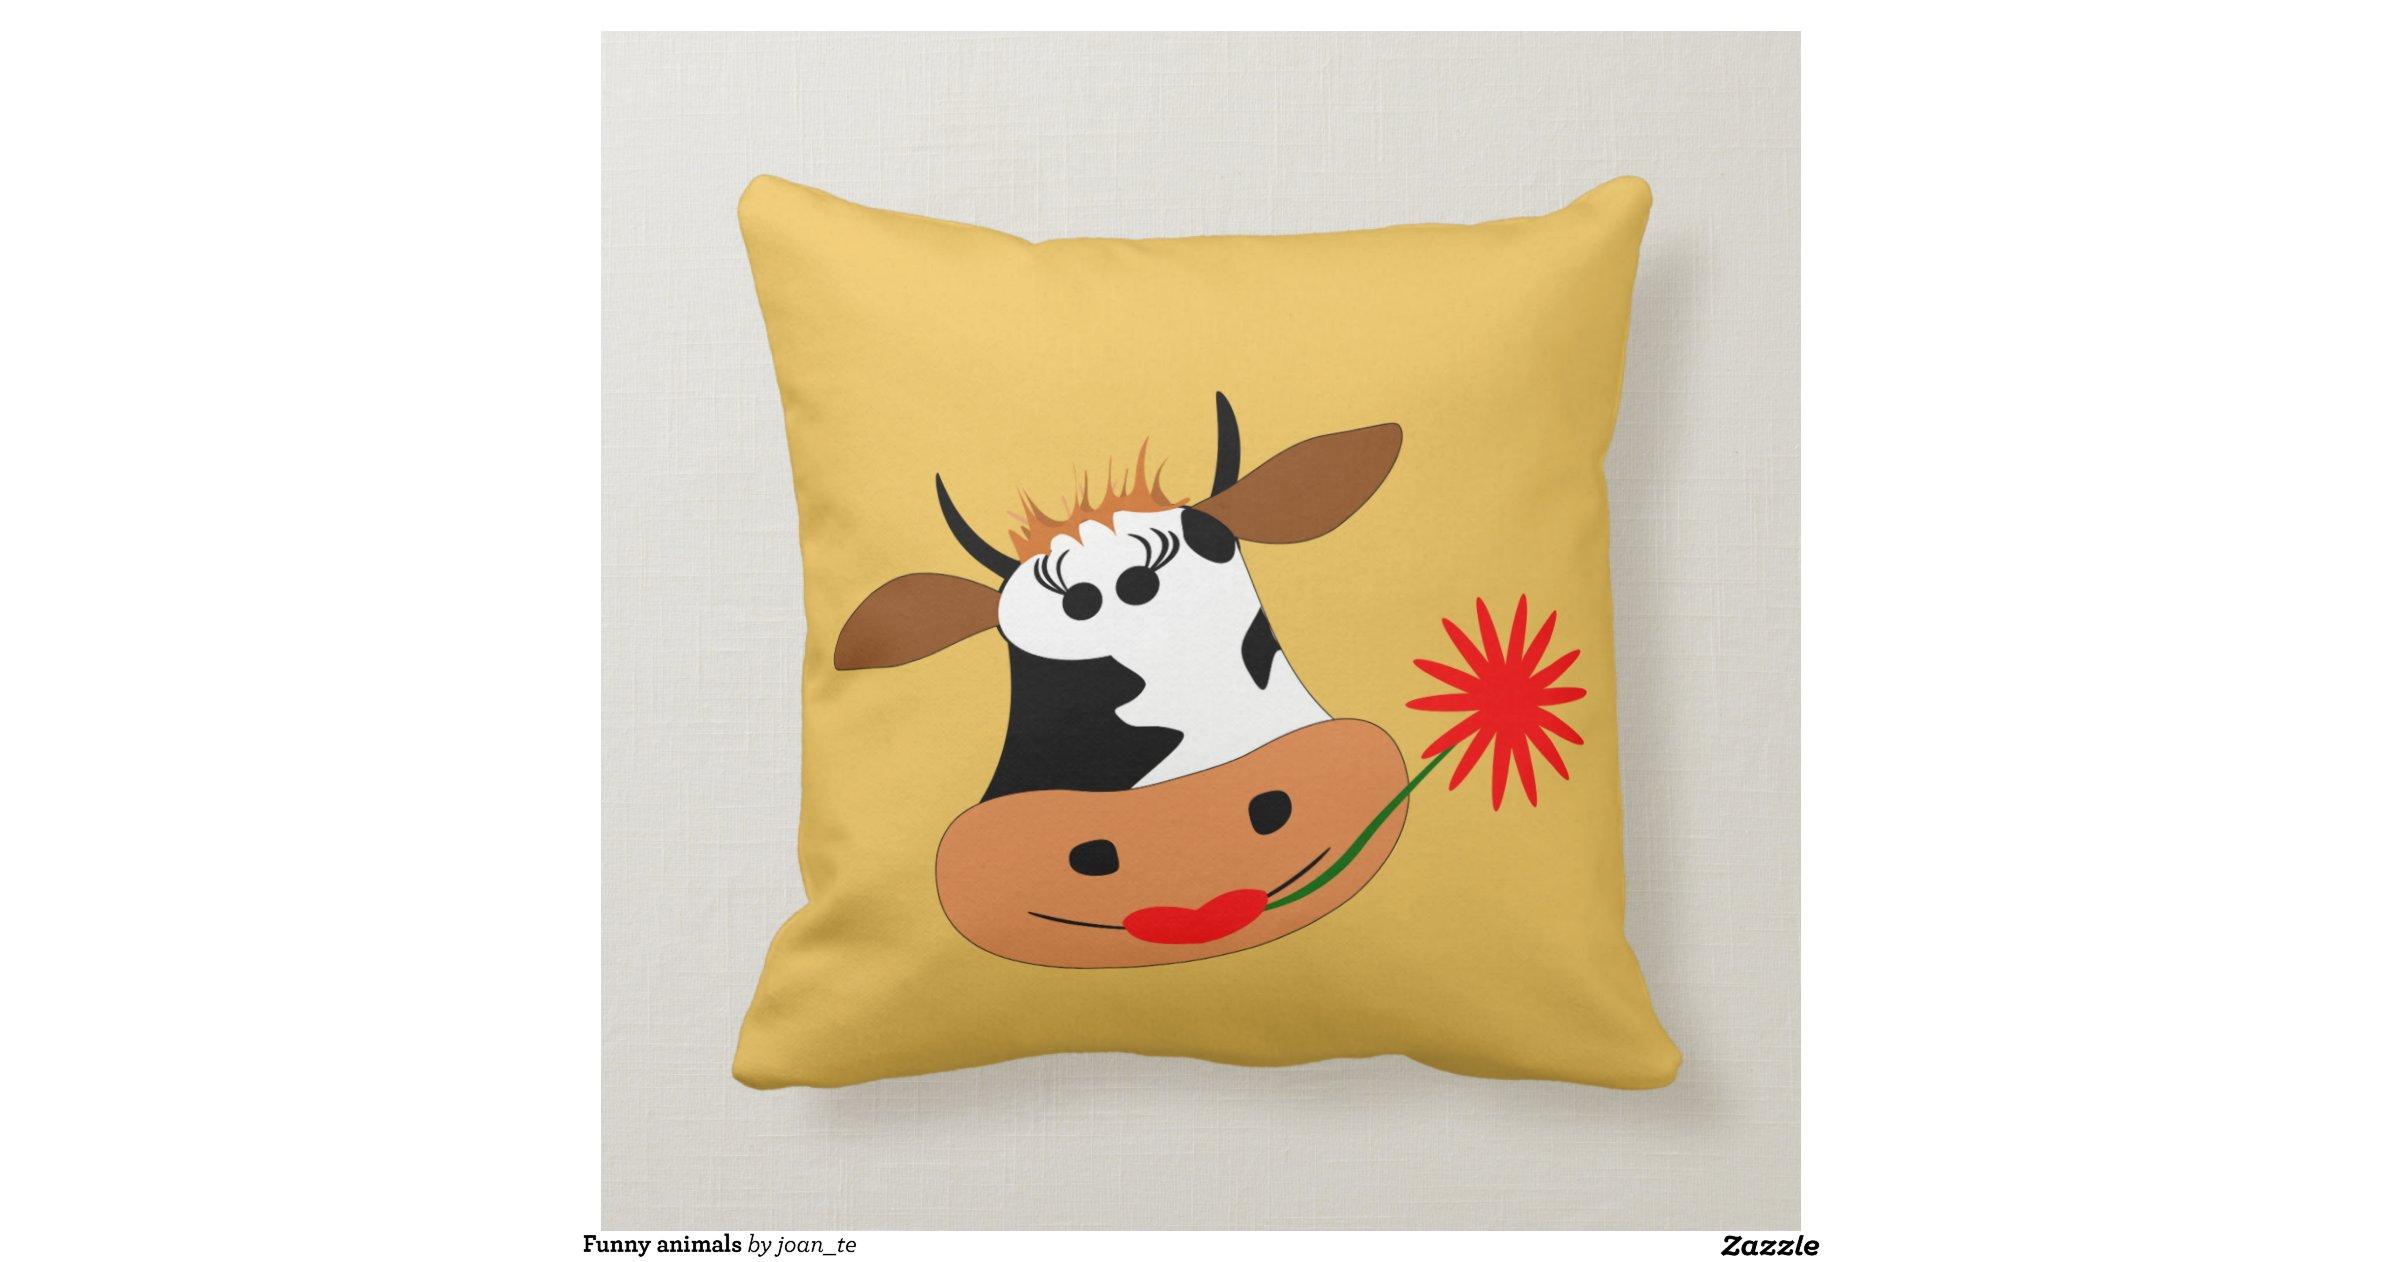 funny_animals_throw_pillows-rb3a702a5bd8a4a10a39a25548d61fab0_i5fqz_8byvr_1200.jpg?view_padding ...